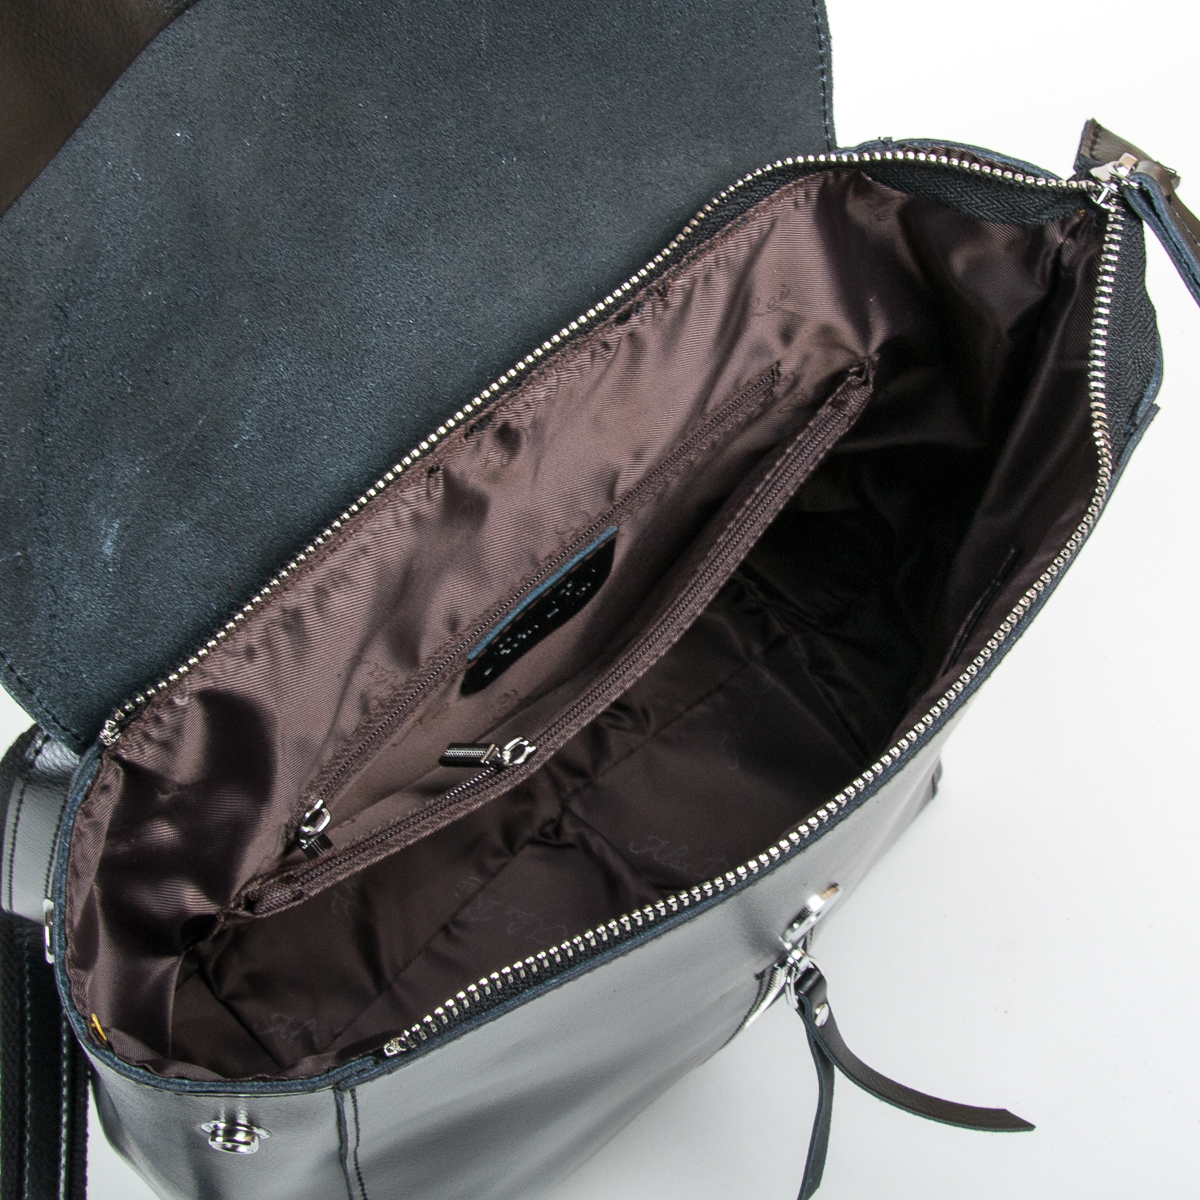 Сумка Женская Рюкзак кожа ALEX RAI 9-01 373 black - фото 5